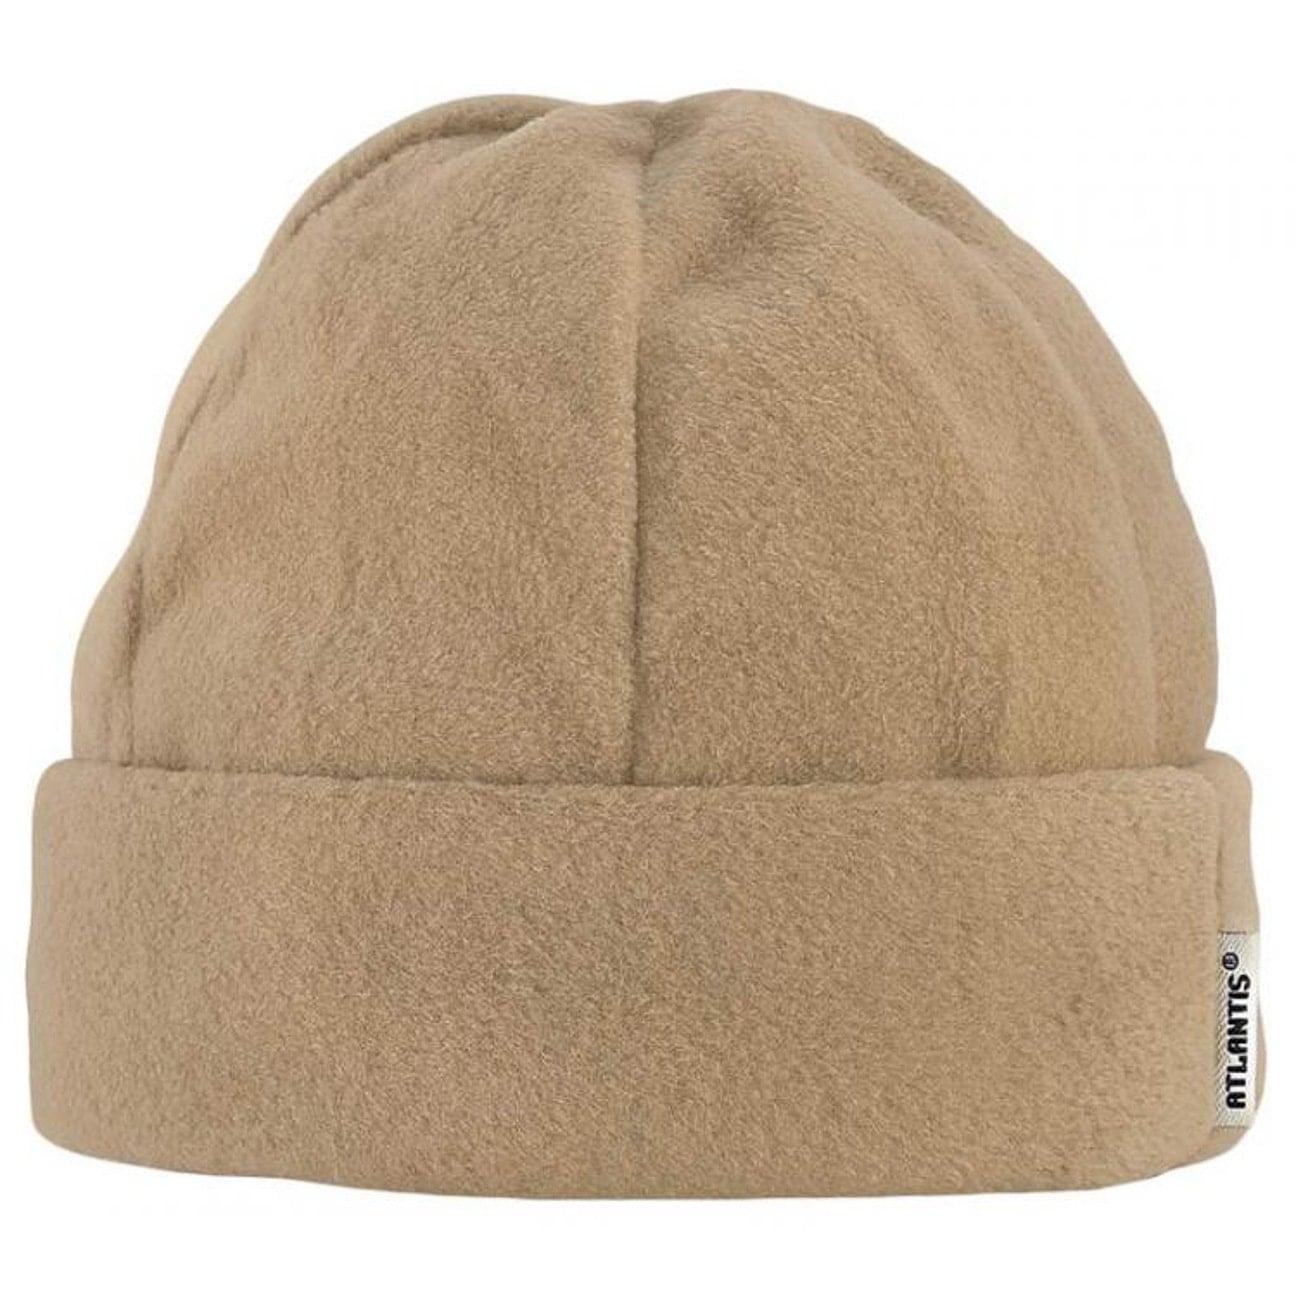 Basic Fleece Hat Tutorial Written: